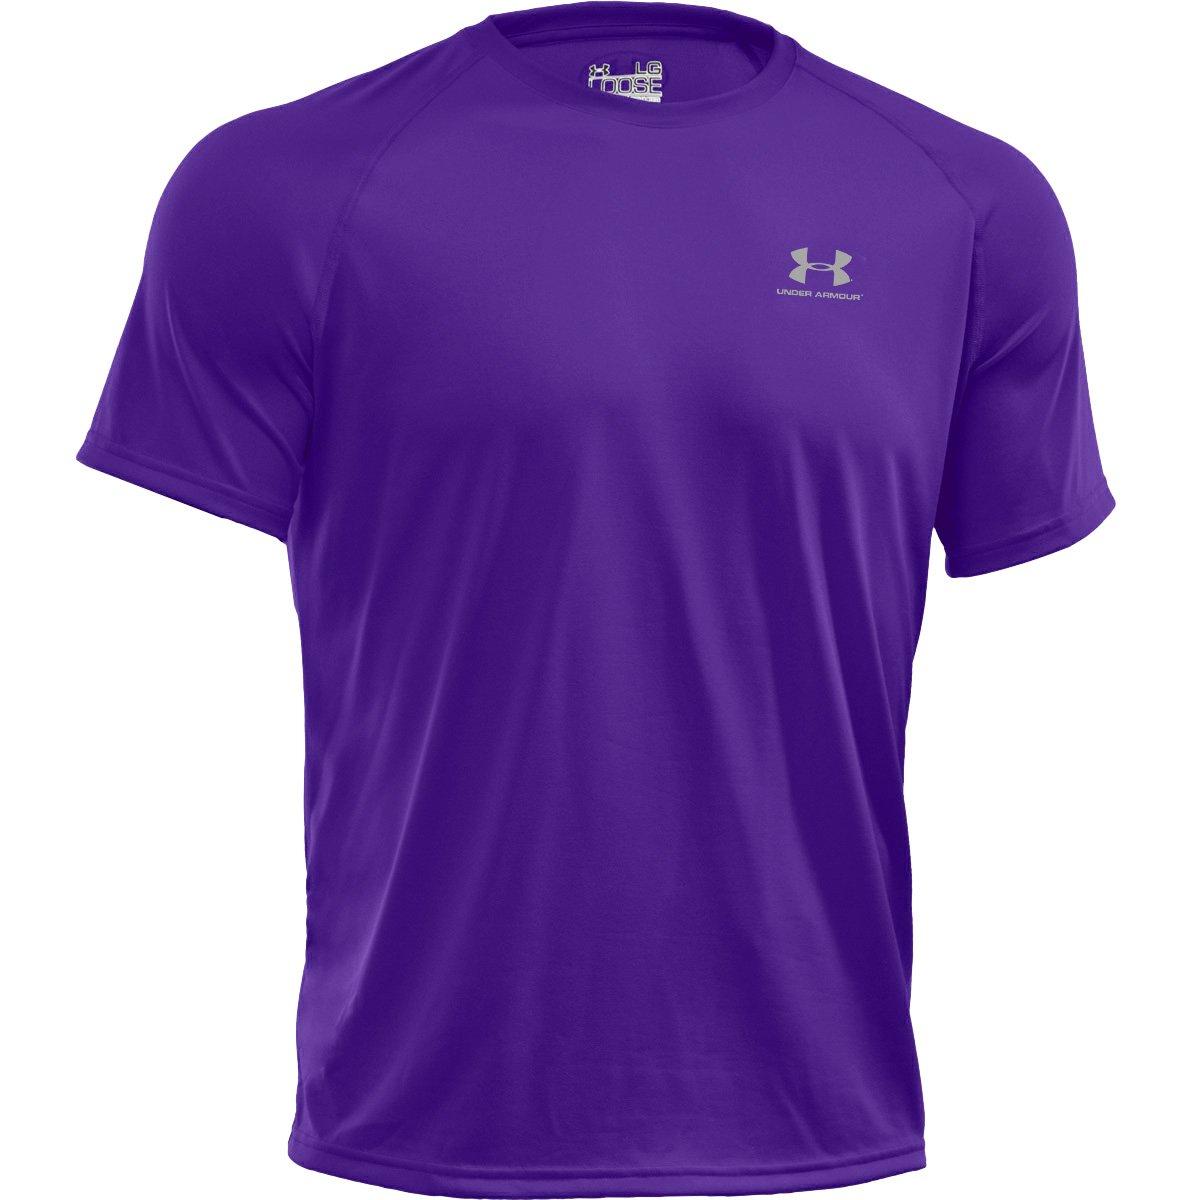 Under Armour Shirt New EU Tech Short Sleeve Tee - Camiseta de running para  hombre 908db6dae8afe